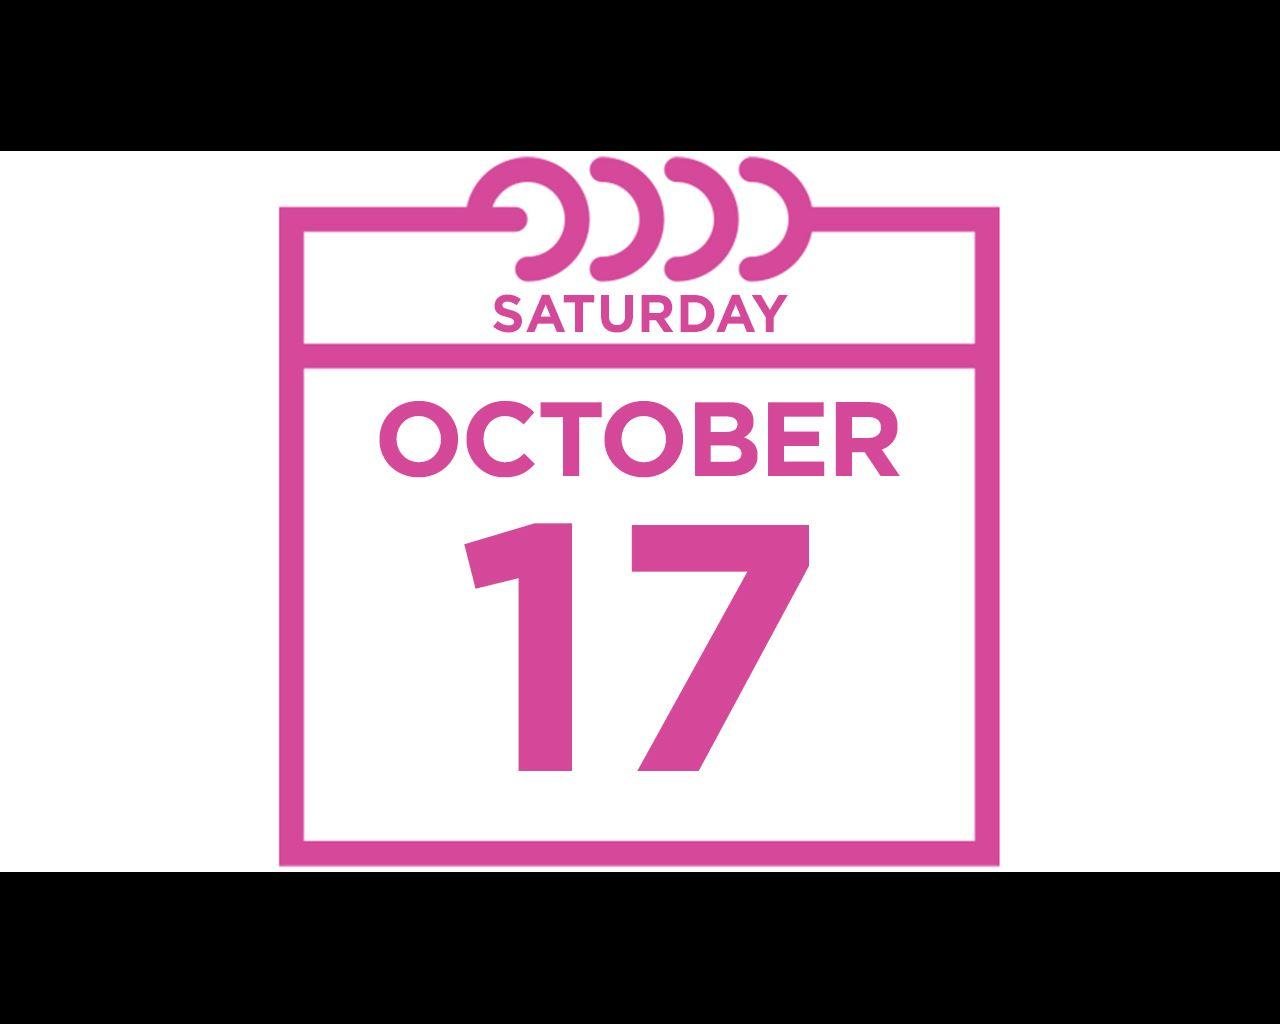 saturday october 17